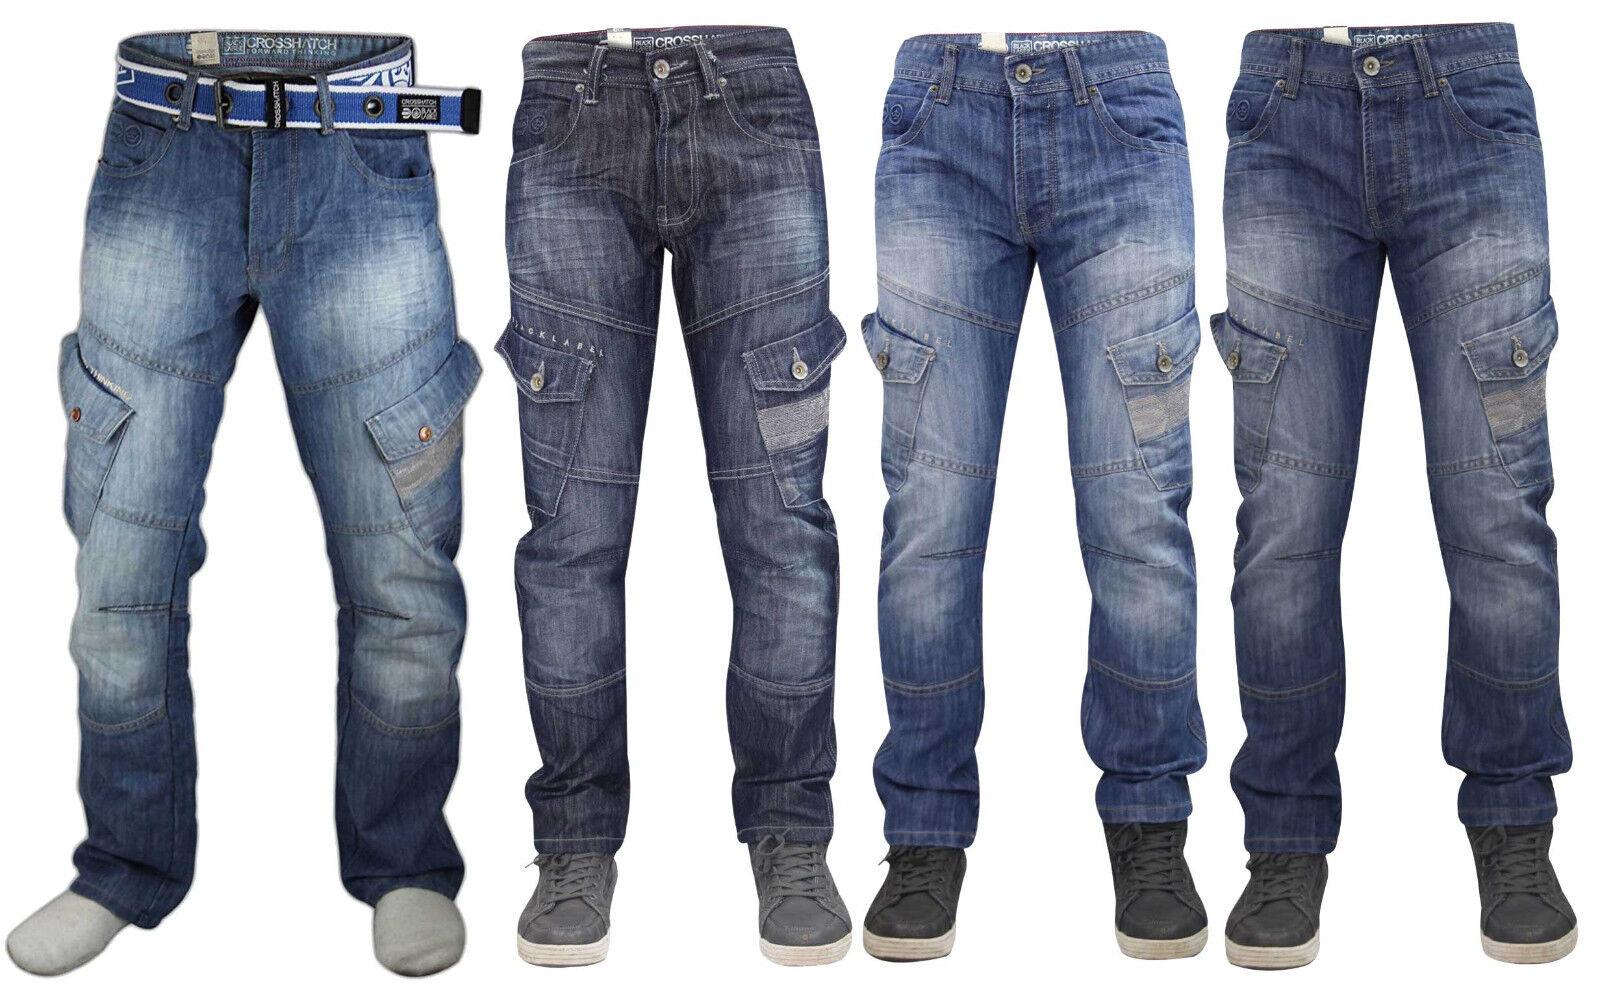 Crosshatch Uomo Sabbiati Jeans Bottoni Fly Regular Cargo Tasche Jeans